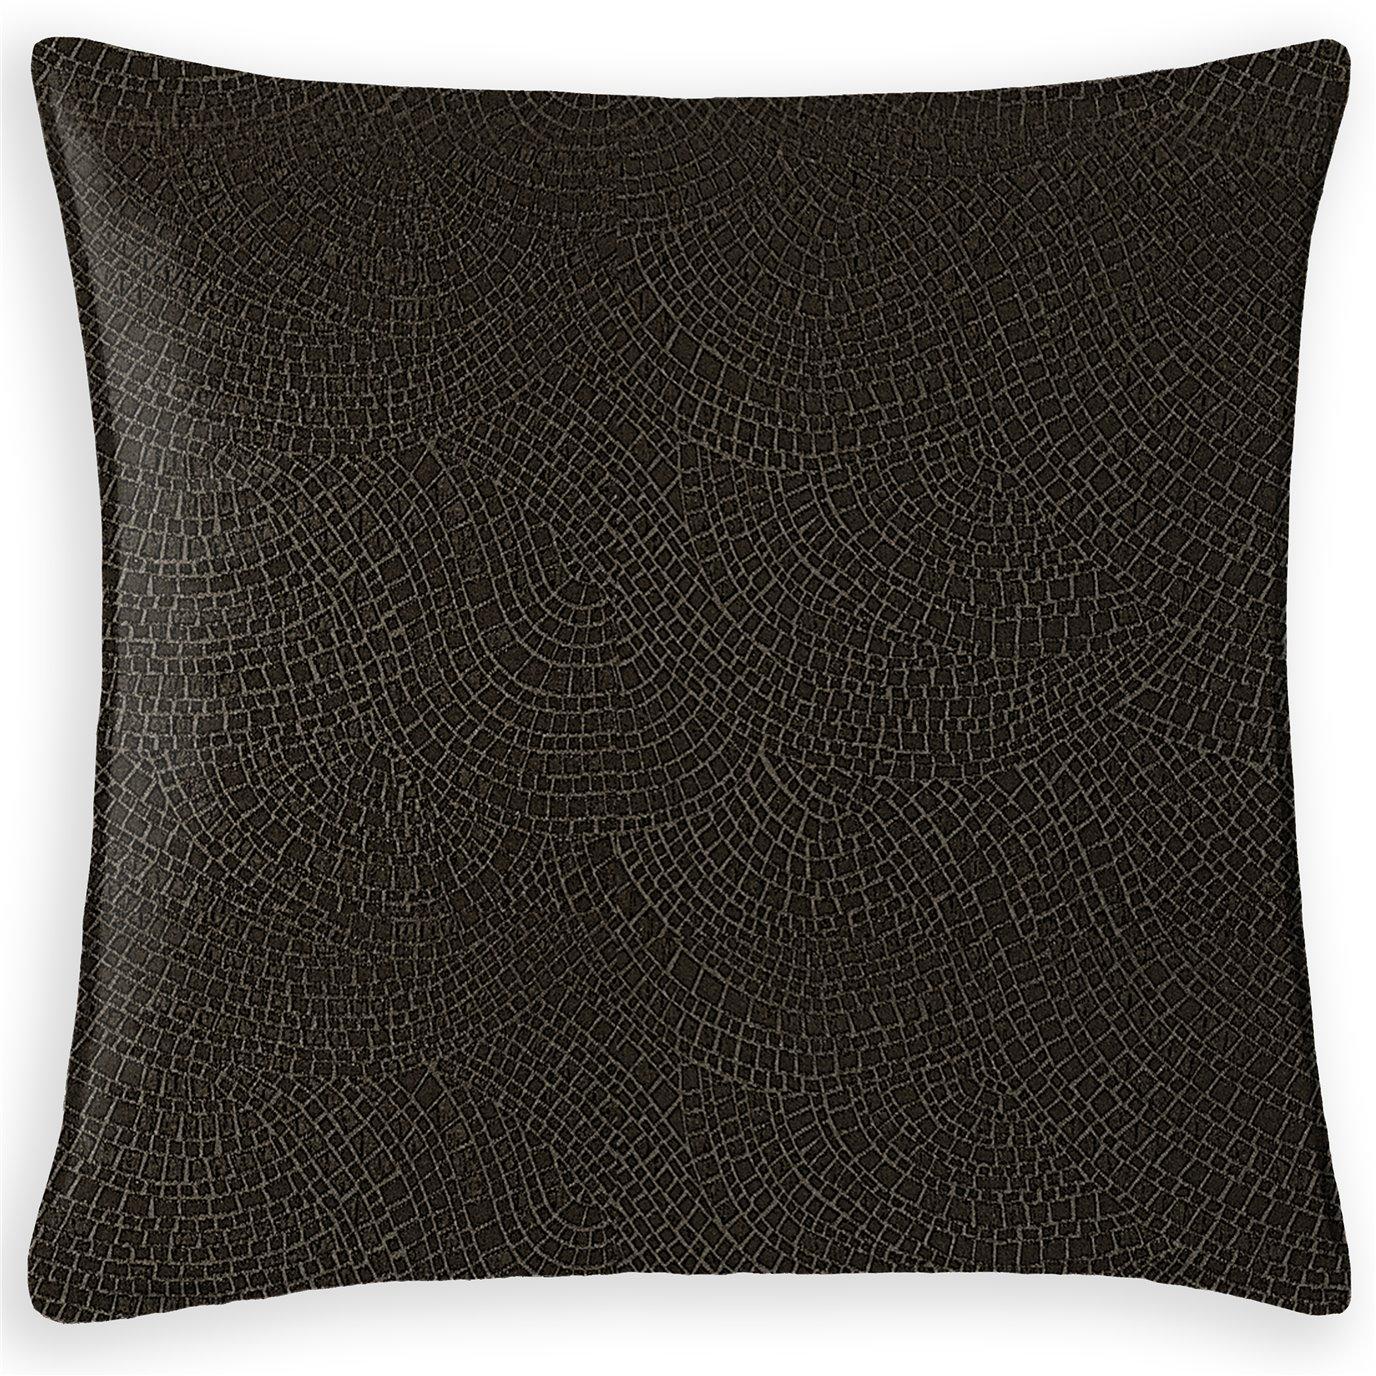 Hickory Lane Coordinate Pillow Sham - Euro